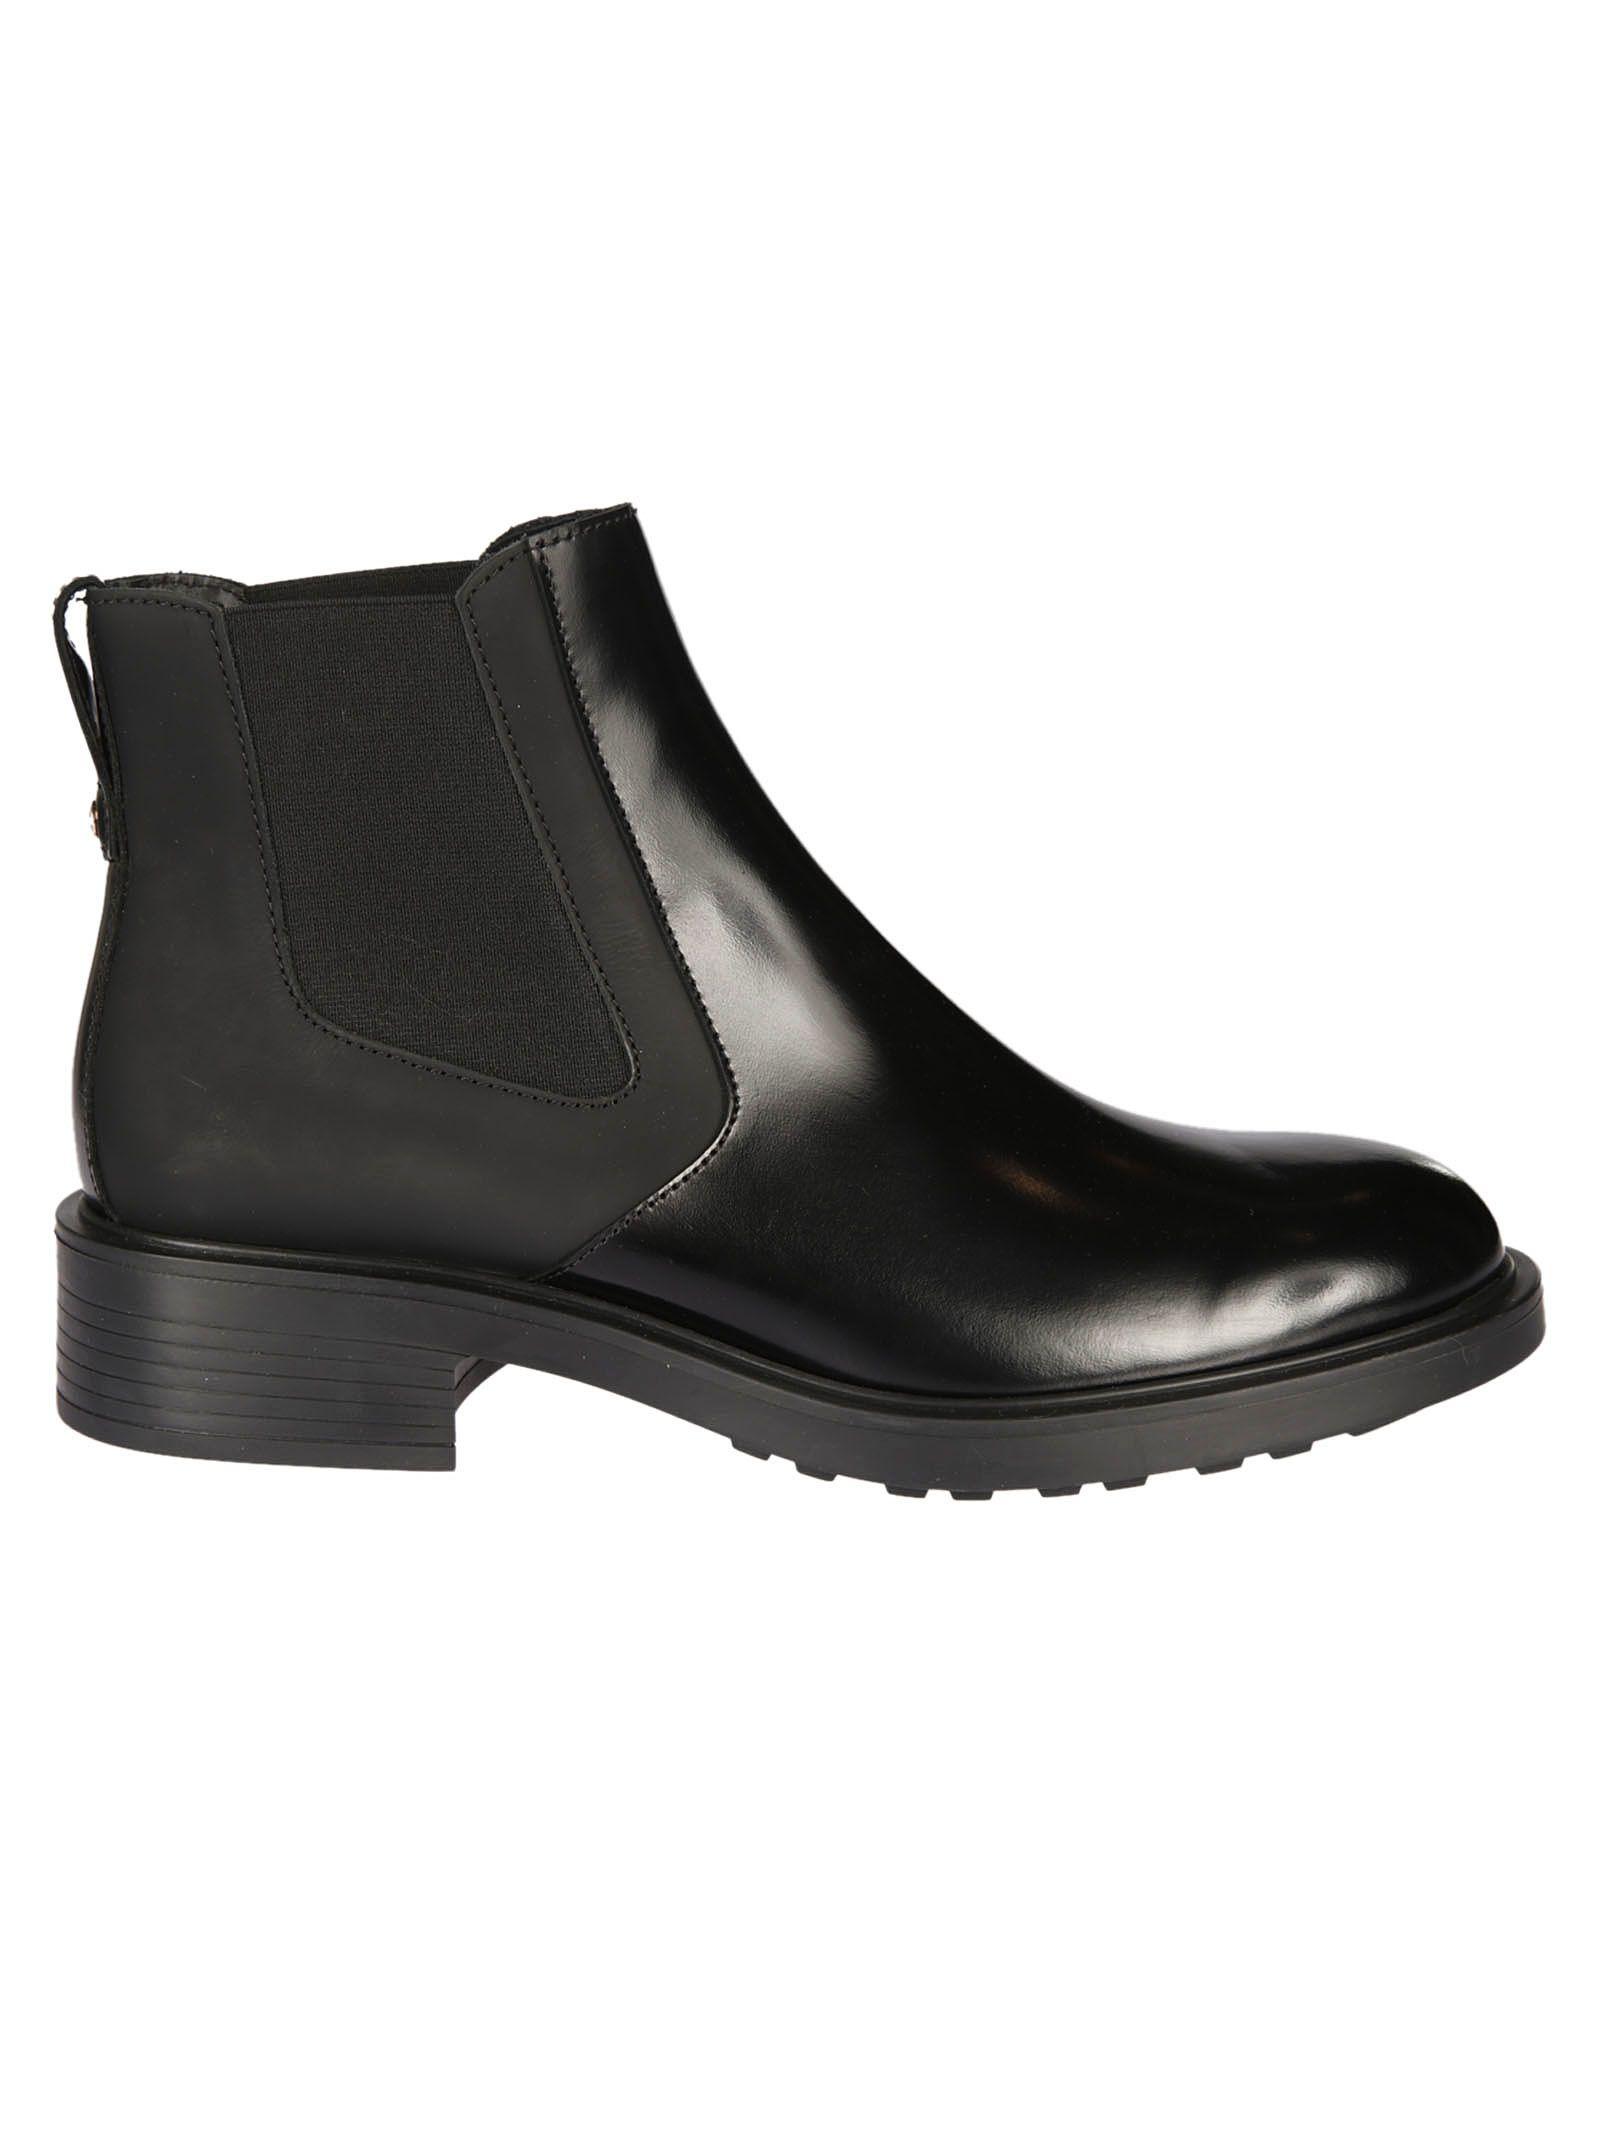 Hogan H332 Ankle Boots